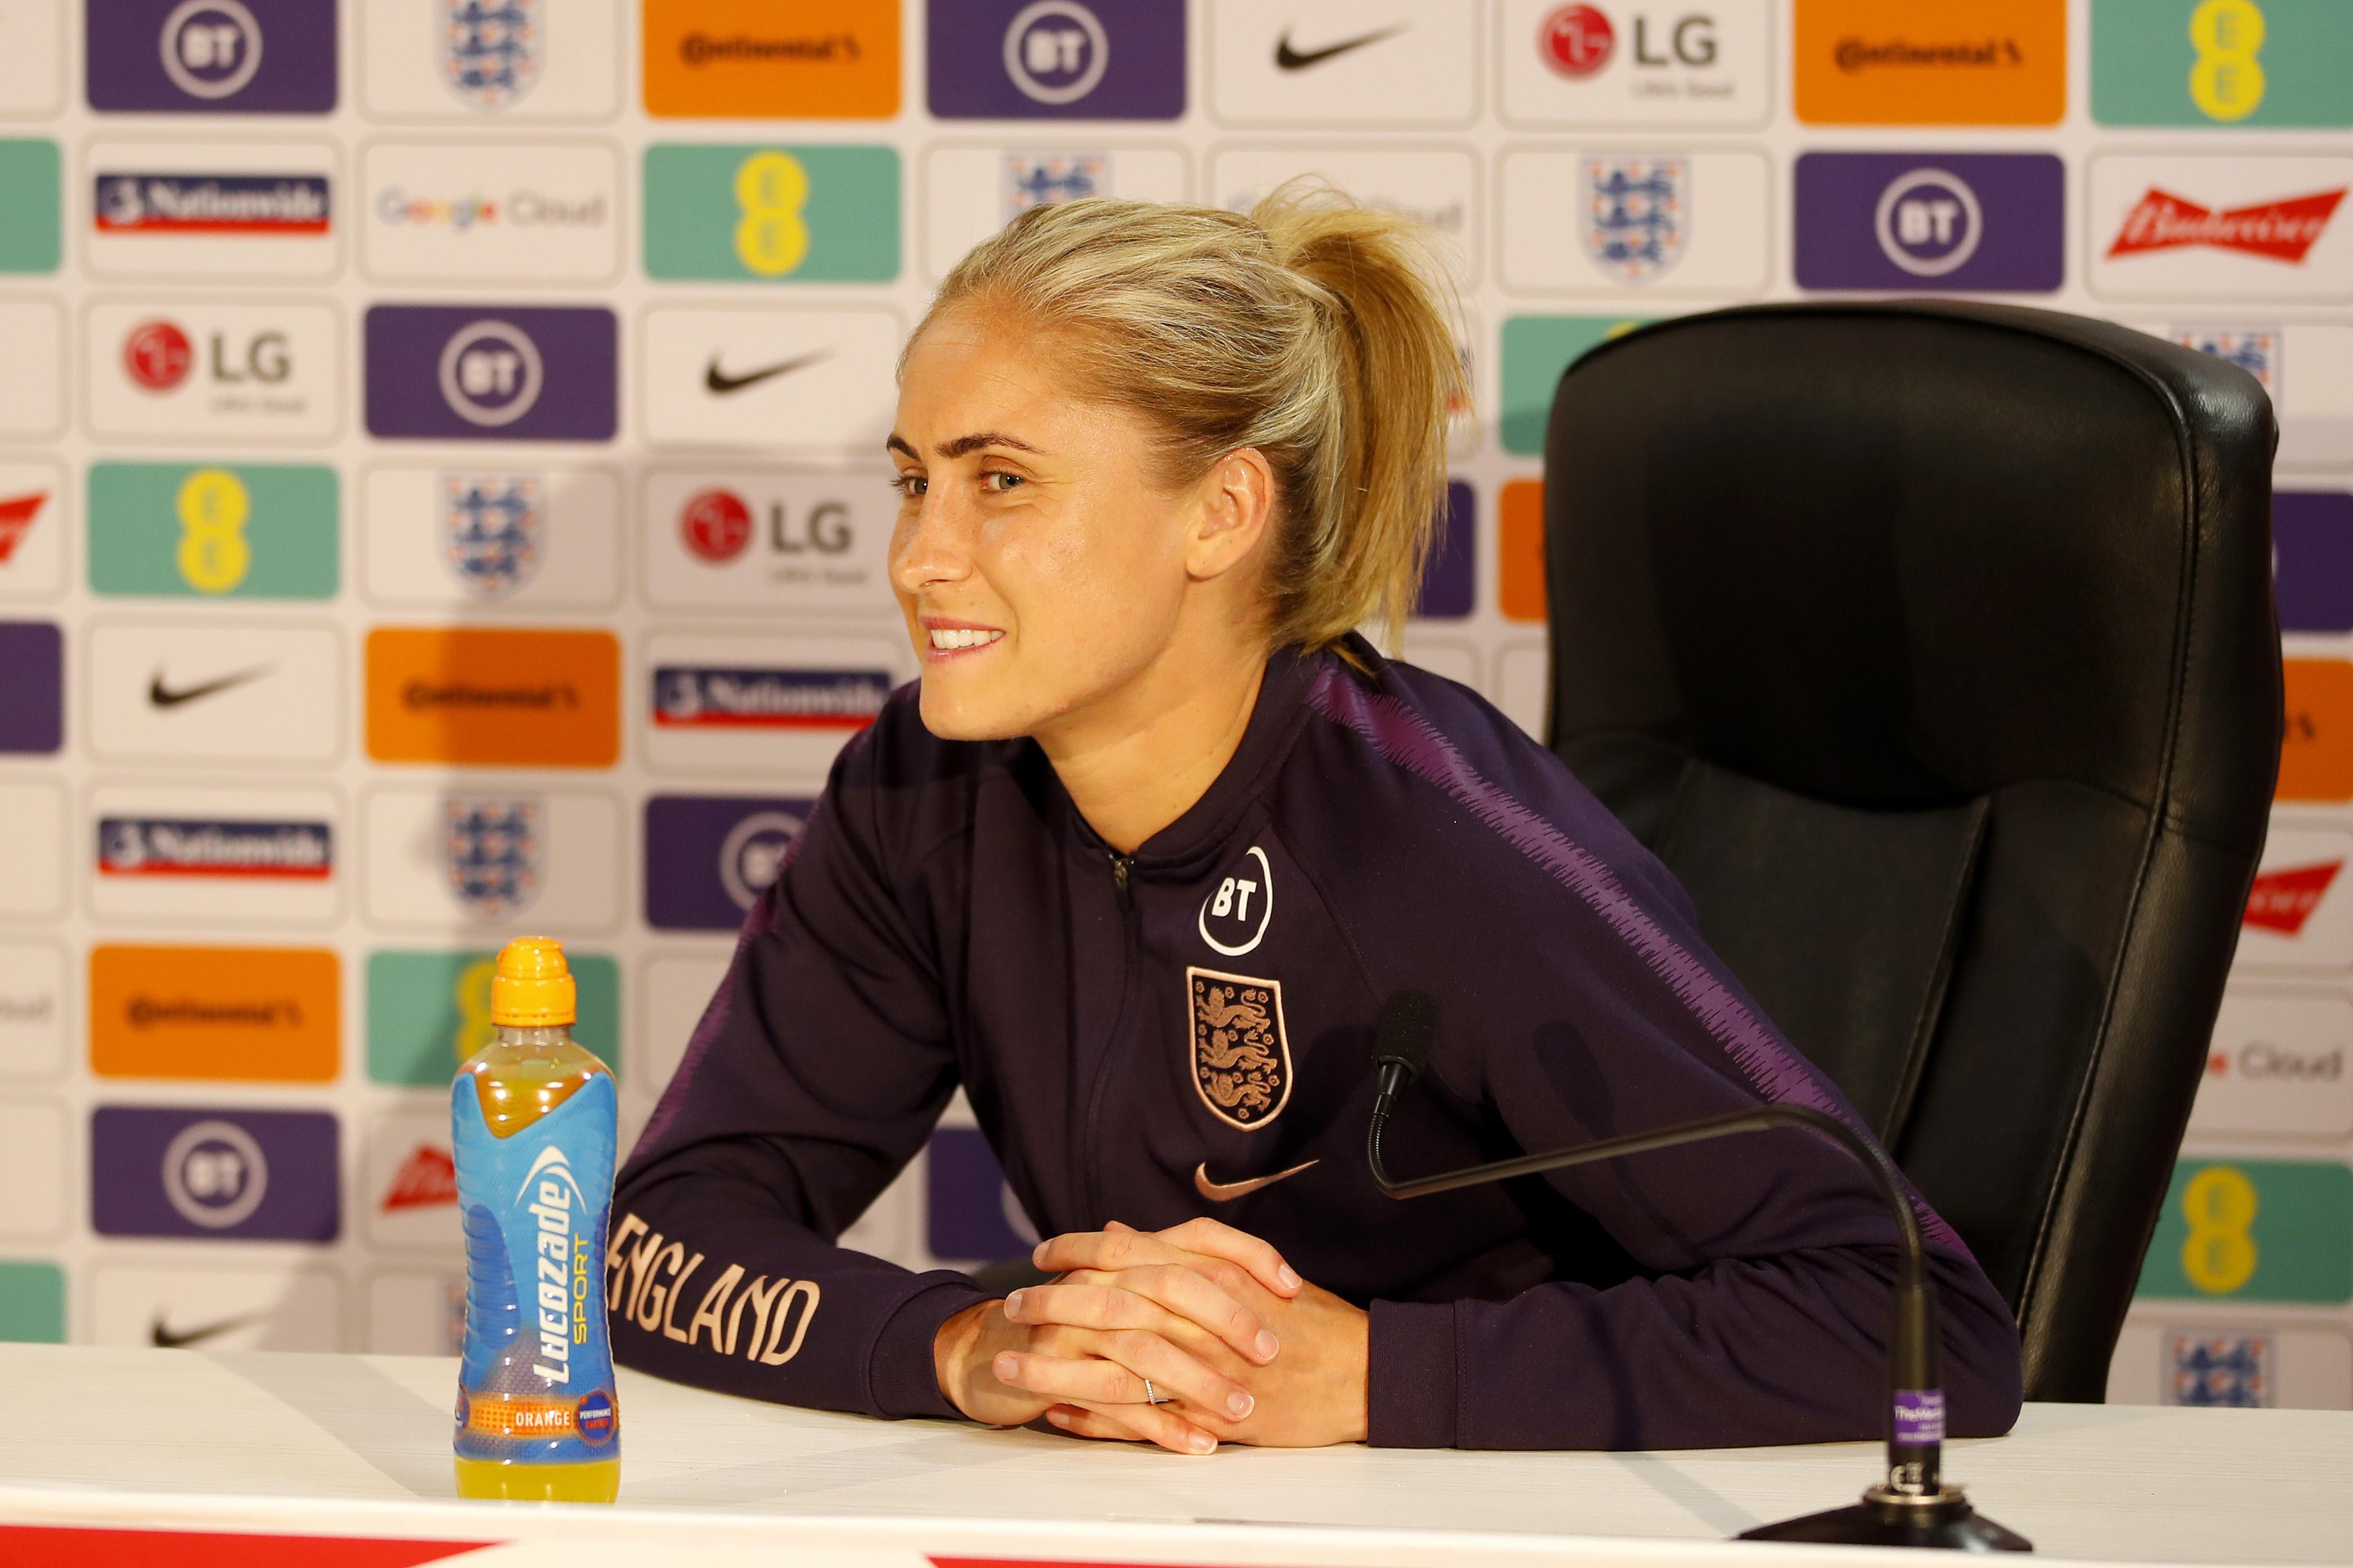 England Women Camp - FIFA Women's World Cup Qualifiers